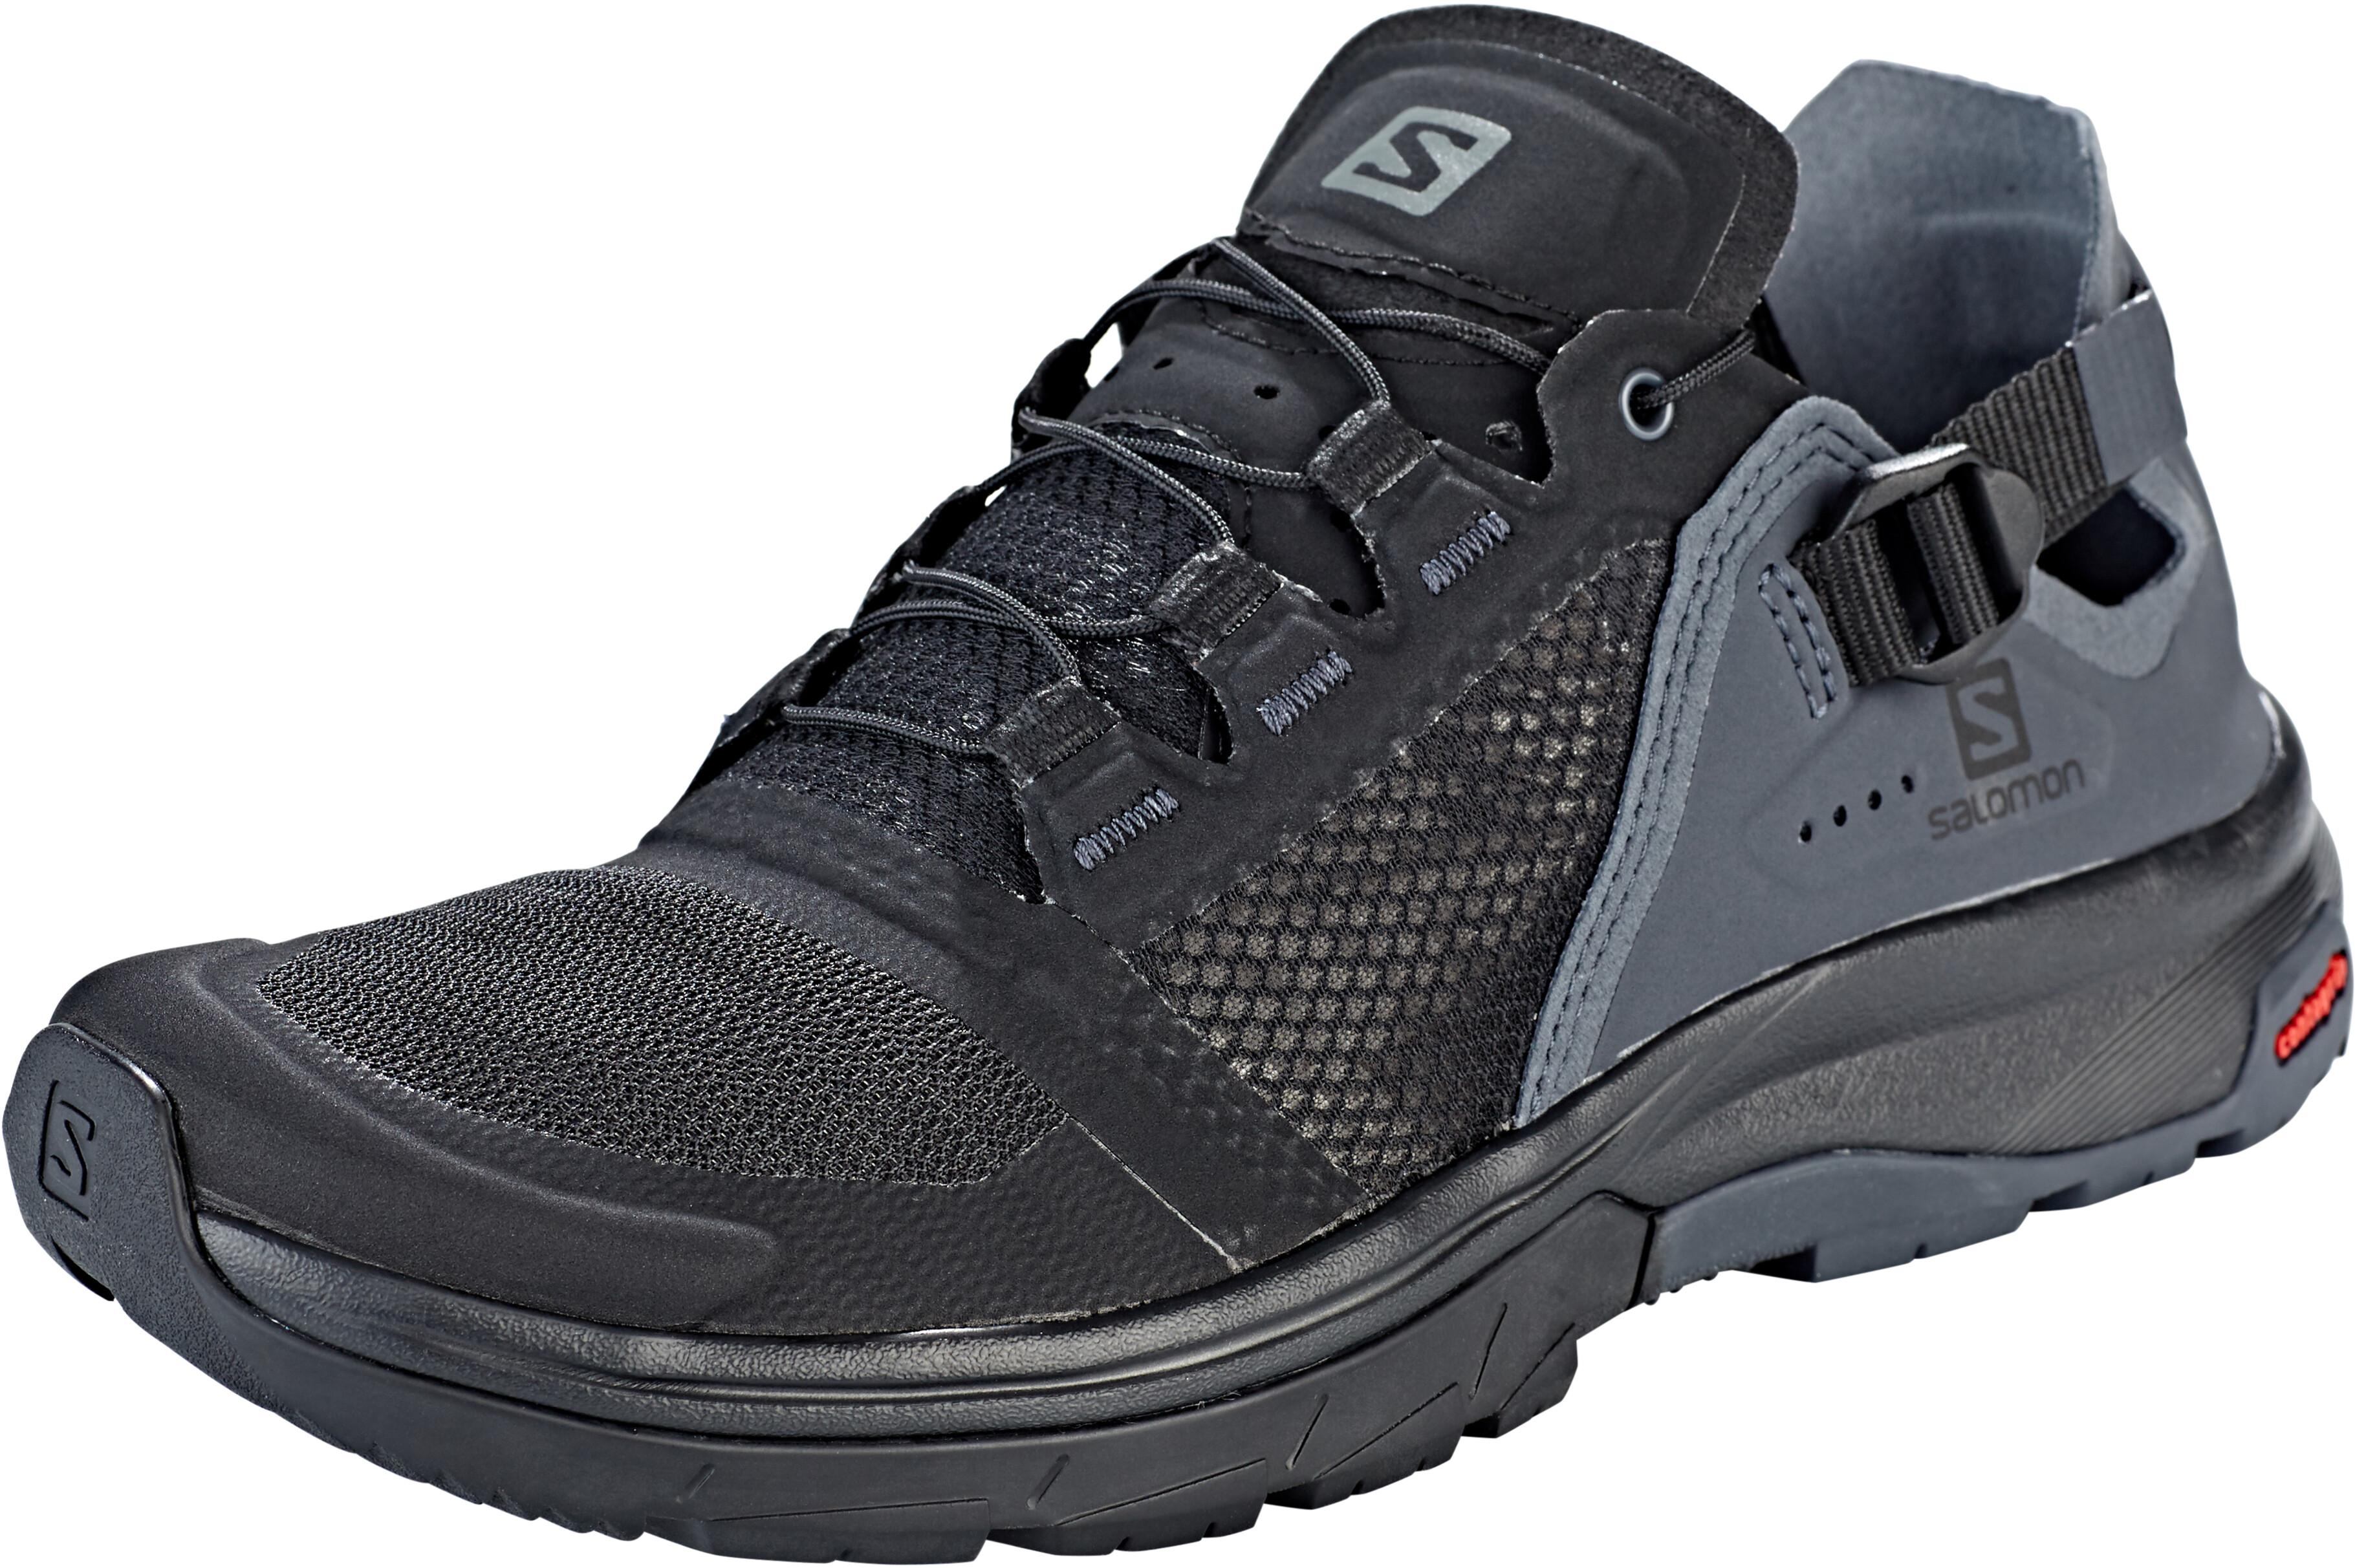 e3ad46c6b Salomon Techamphibian 4 - Calzado Mujer - gris negro